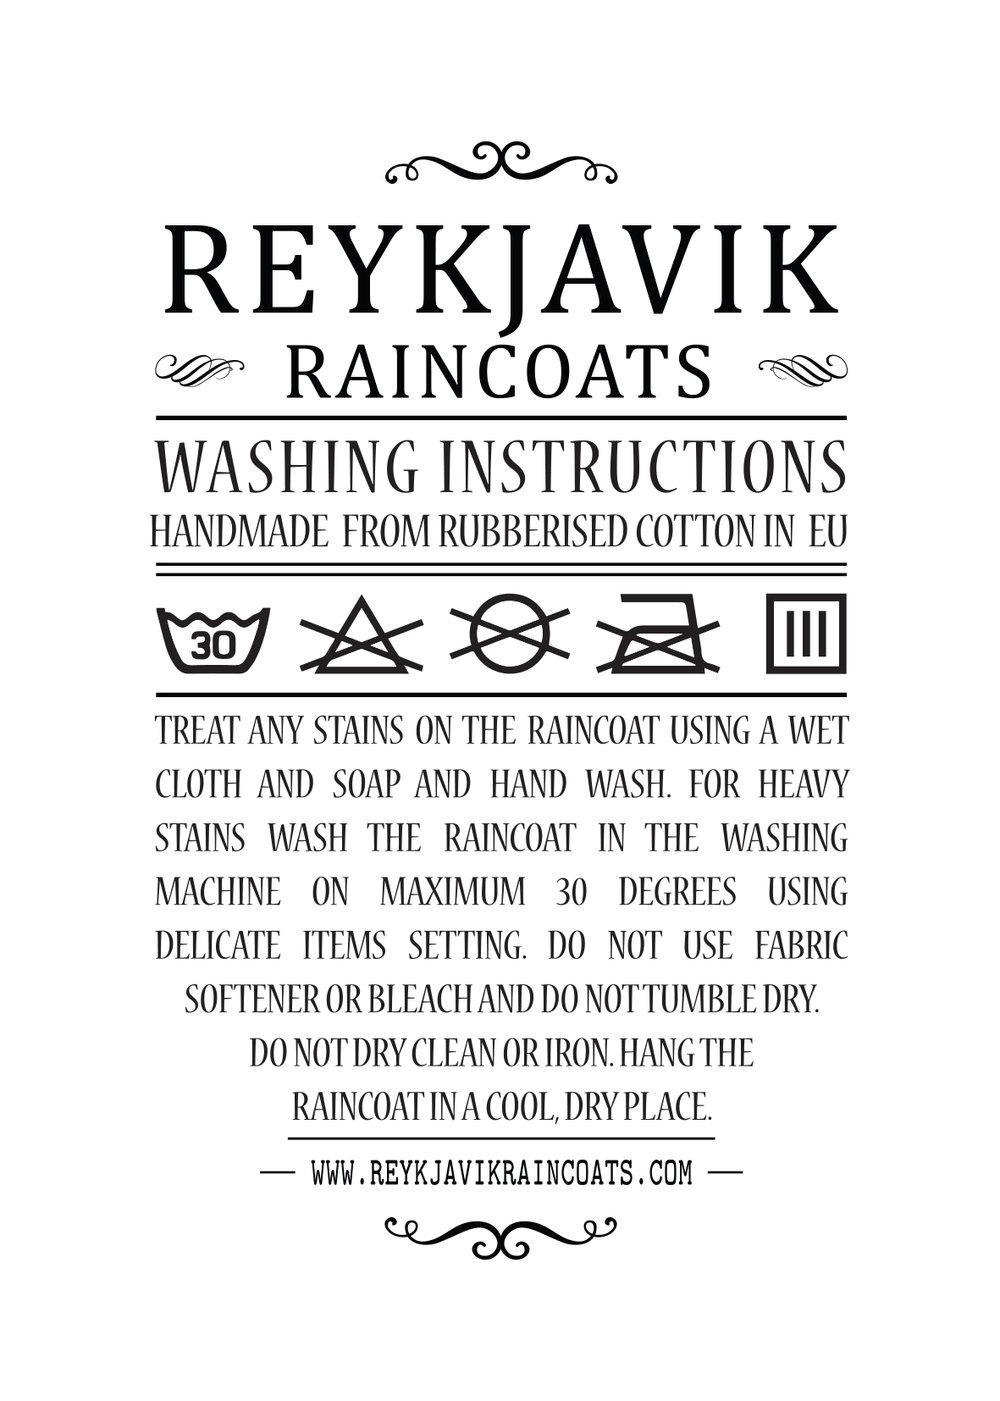 Washing Istructions.jpg